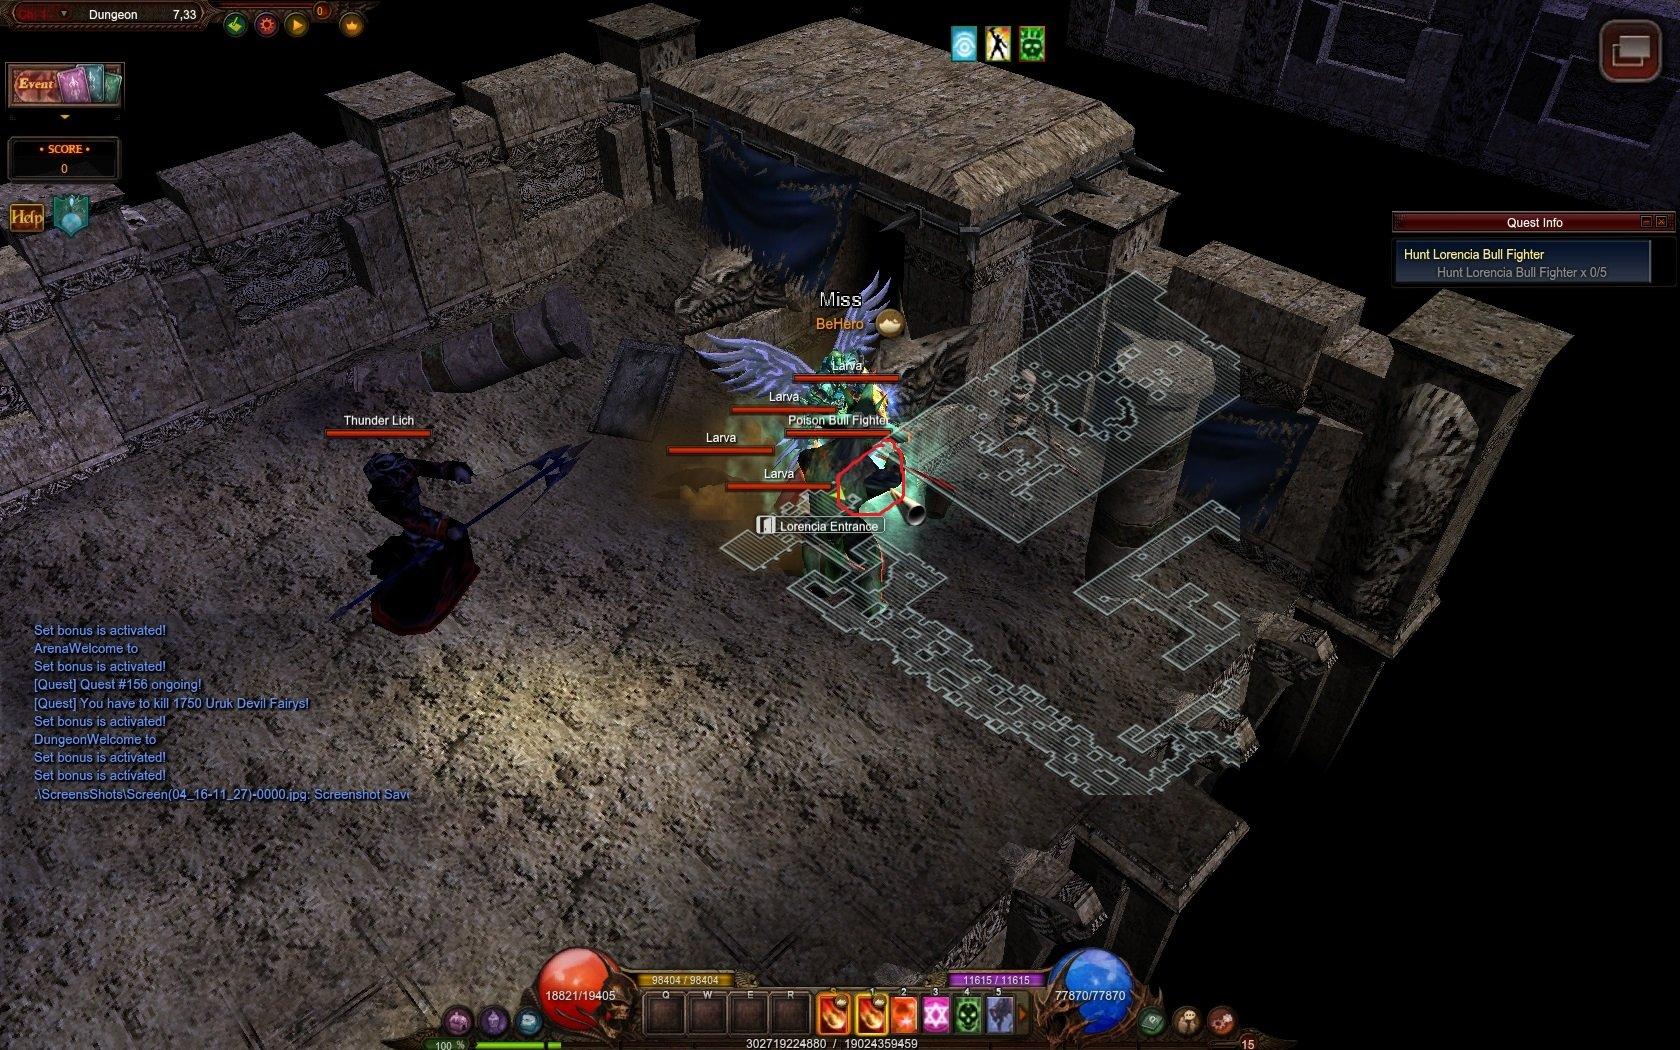 dungeon.jpg.21749616db16f789b308b8e0f281f85b.jpg